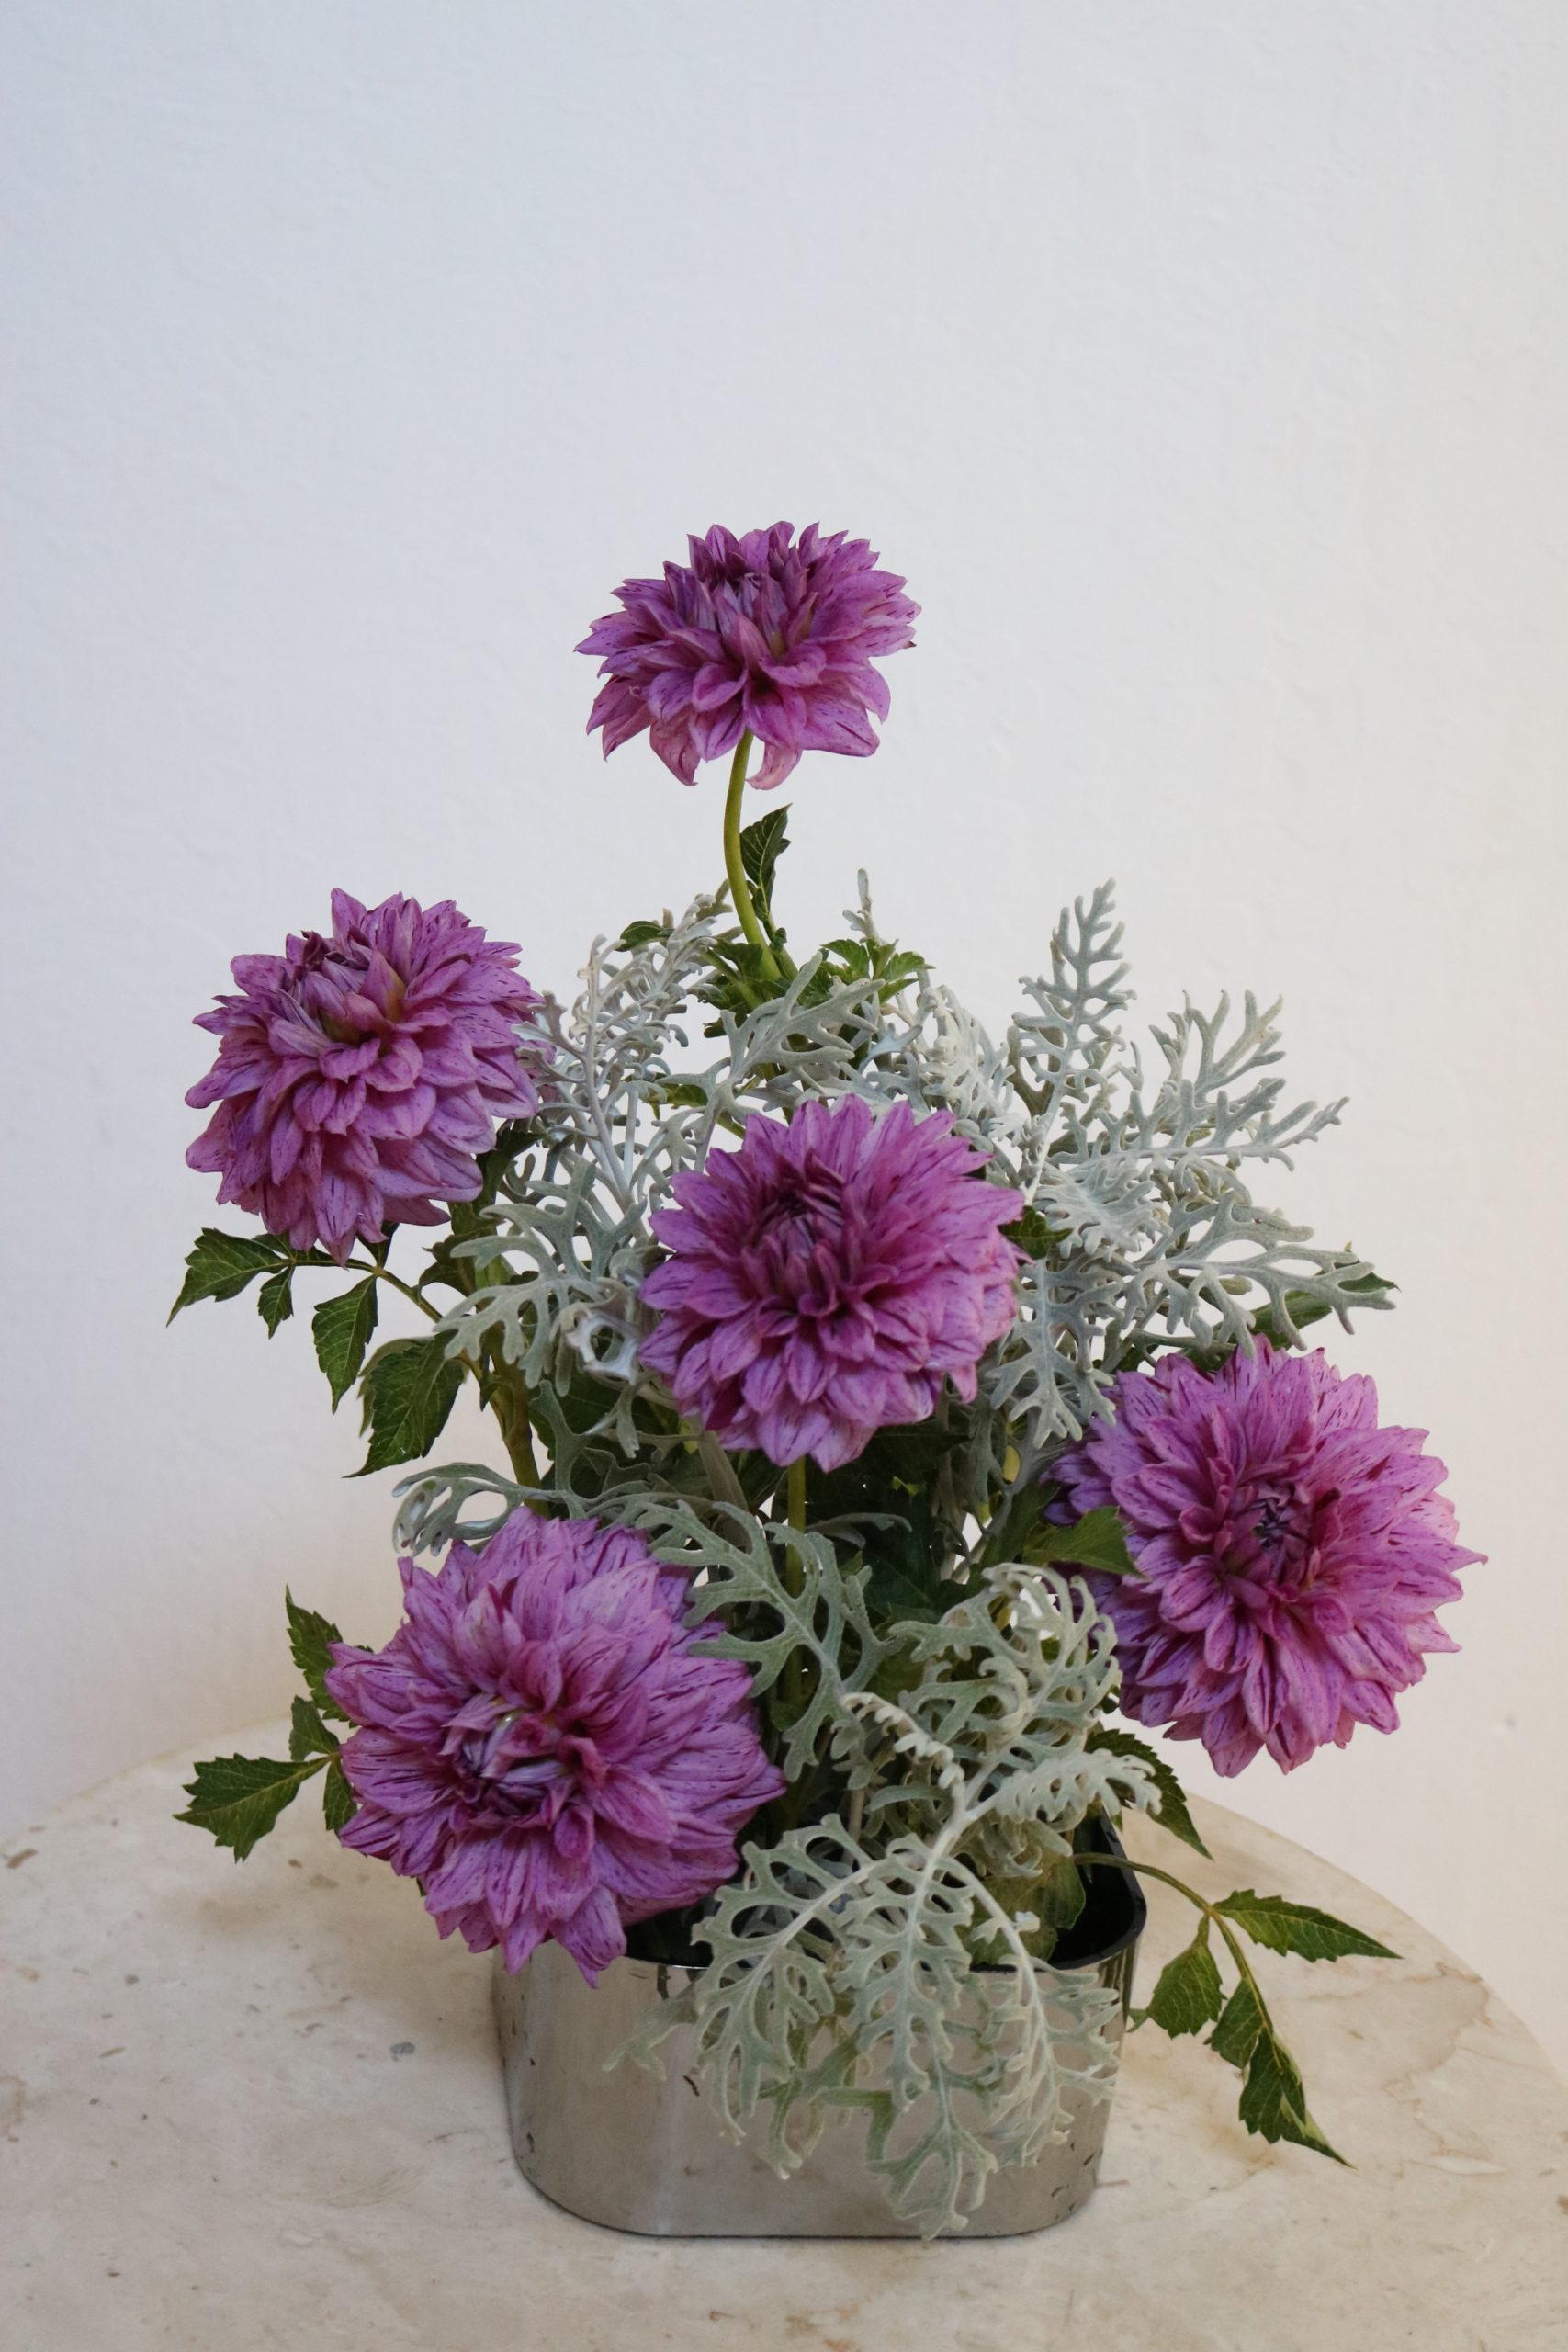 Favorite Bouquet - 9901 Vernon Rose Bouquet, Beverly Dahlstedt